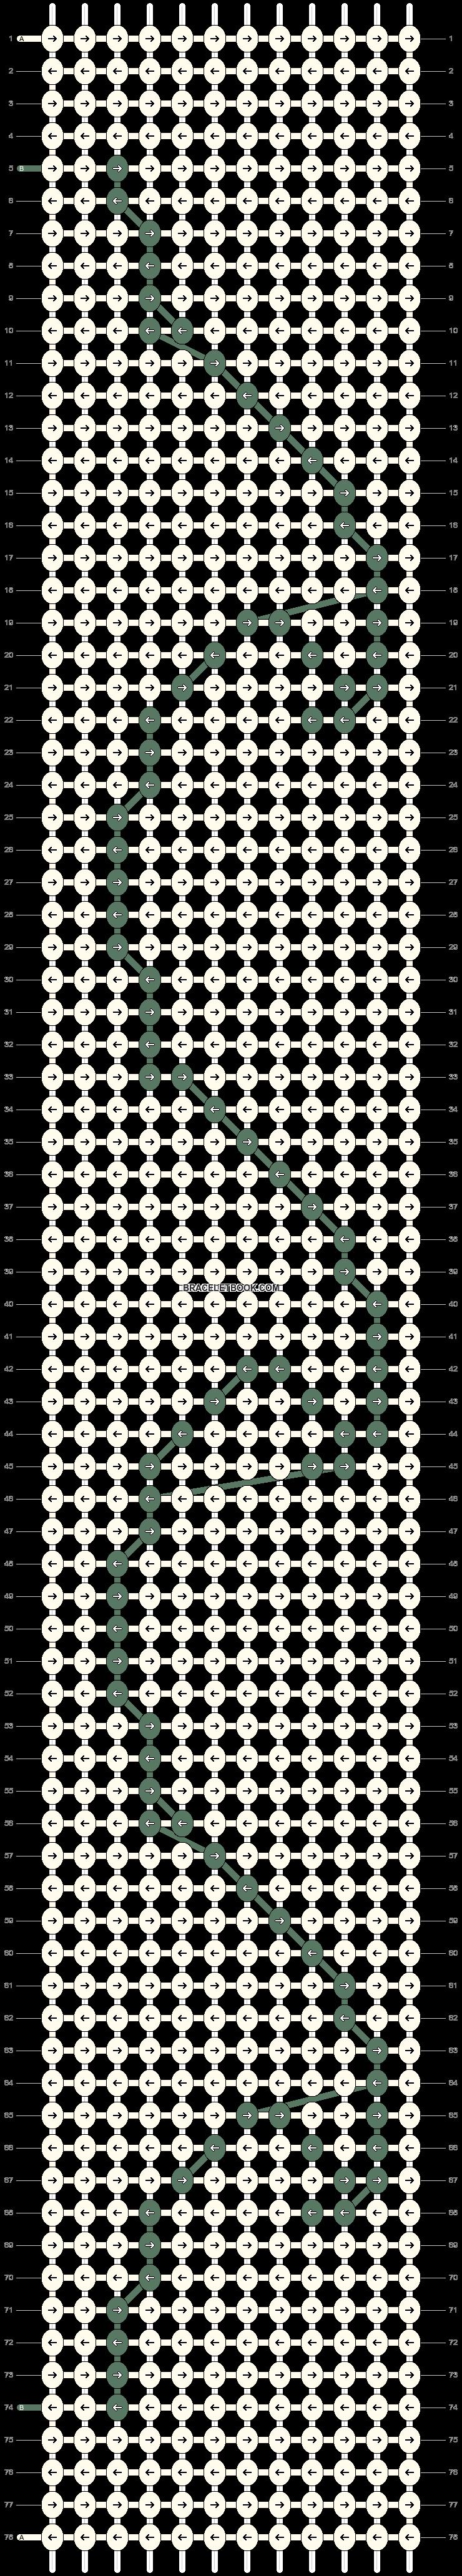 Alpha pattern #98316 pattern